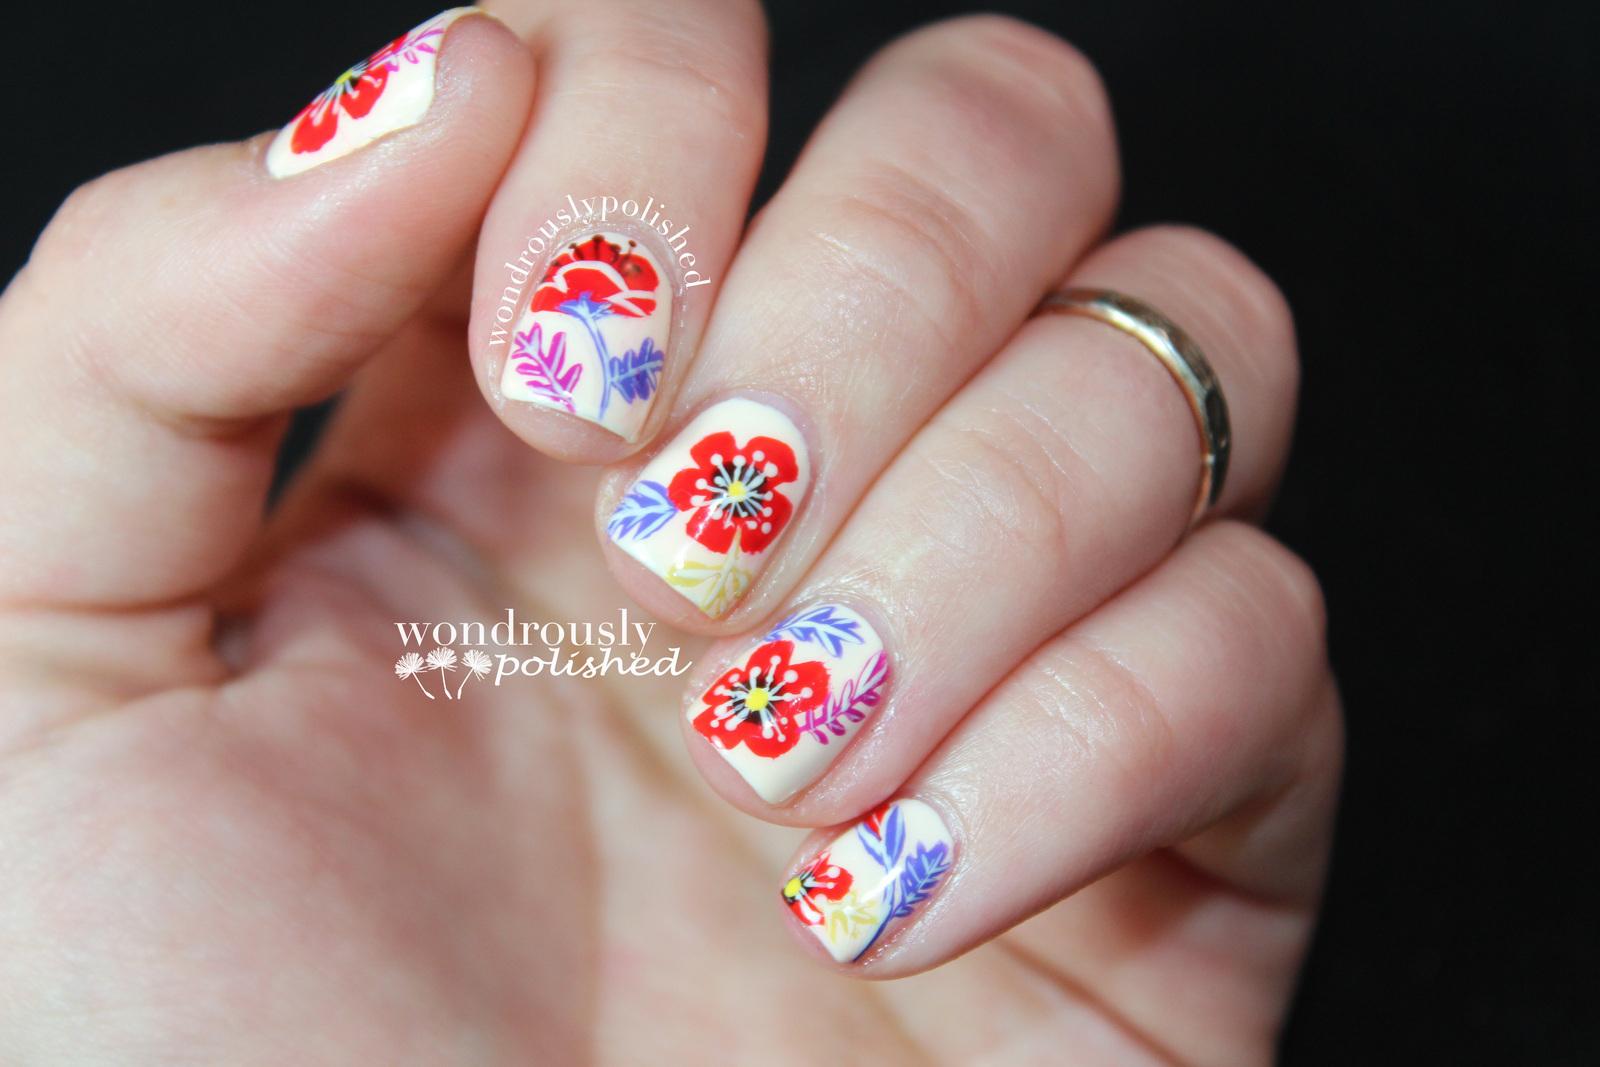 Floral Nail Art 183 How To Paint Patterned Nail Art 183 Nail